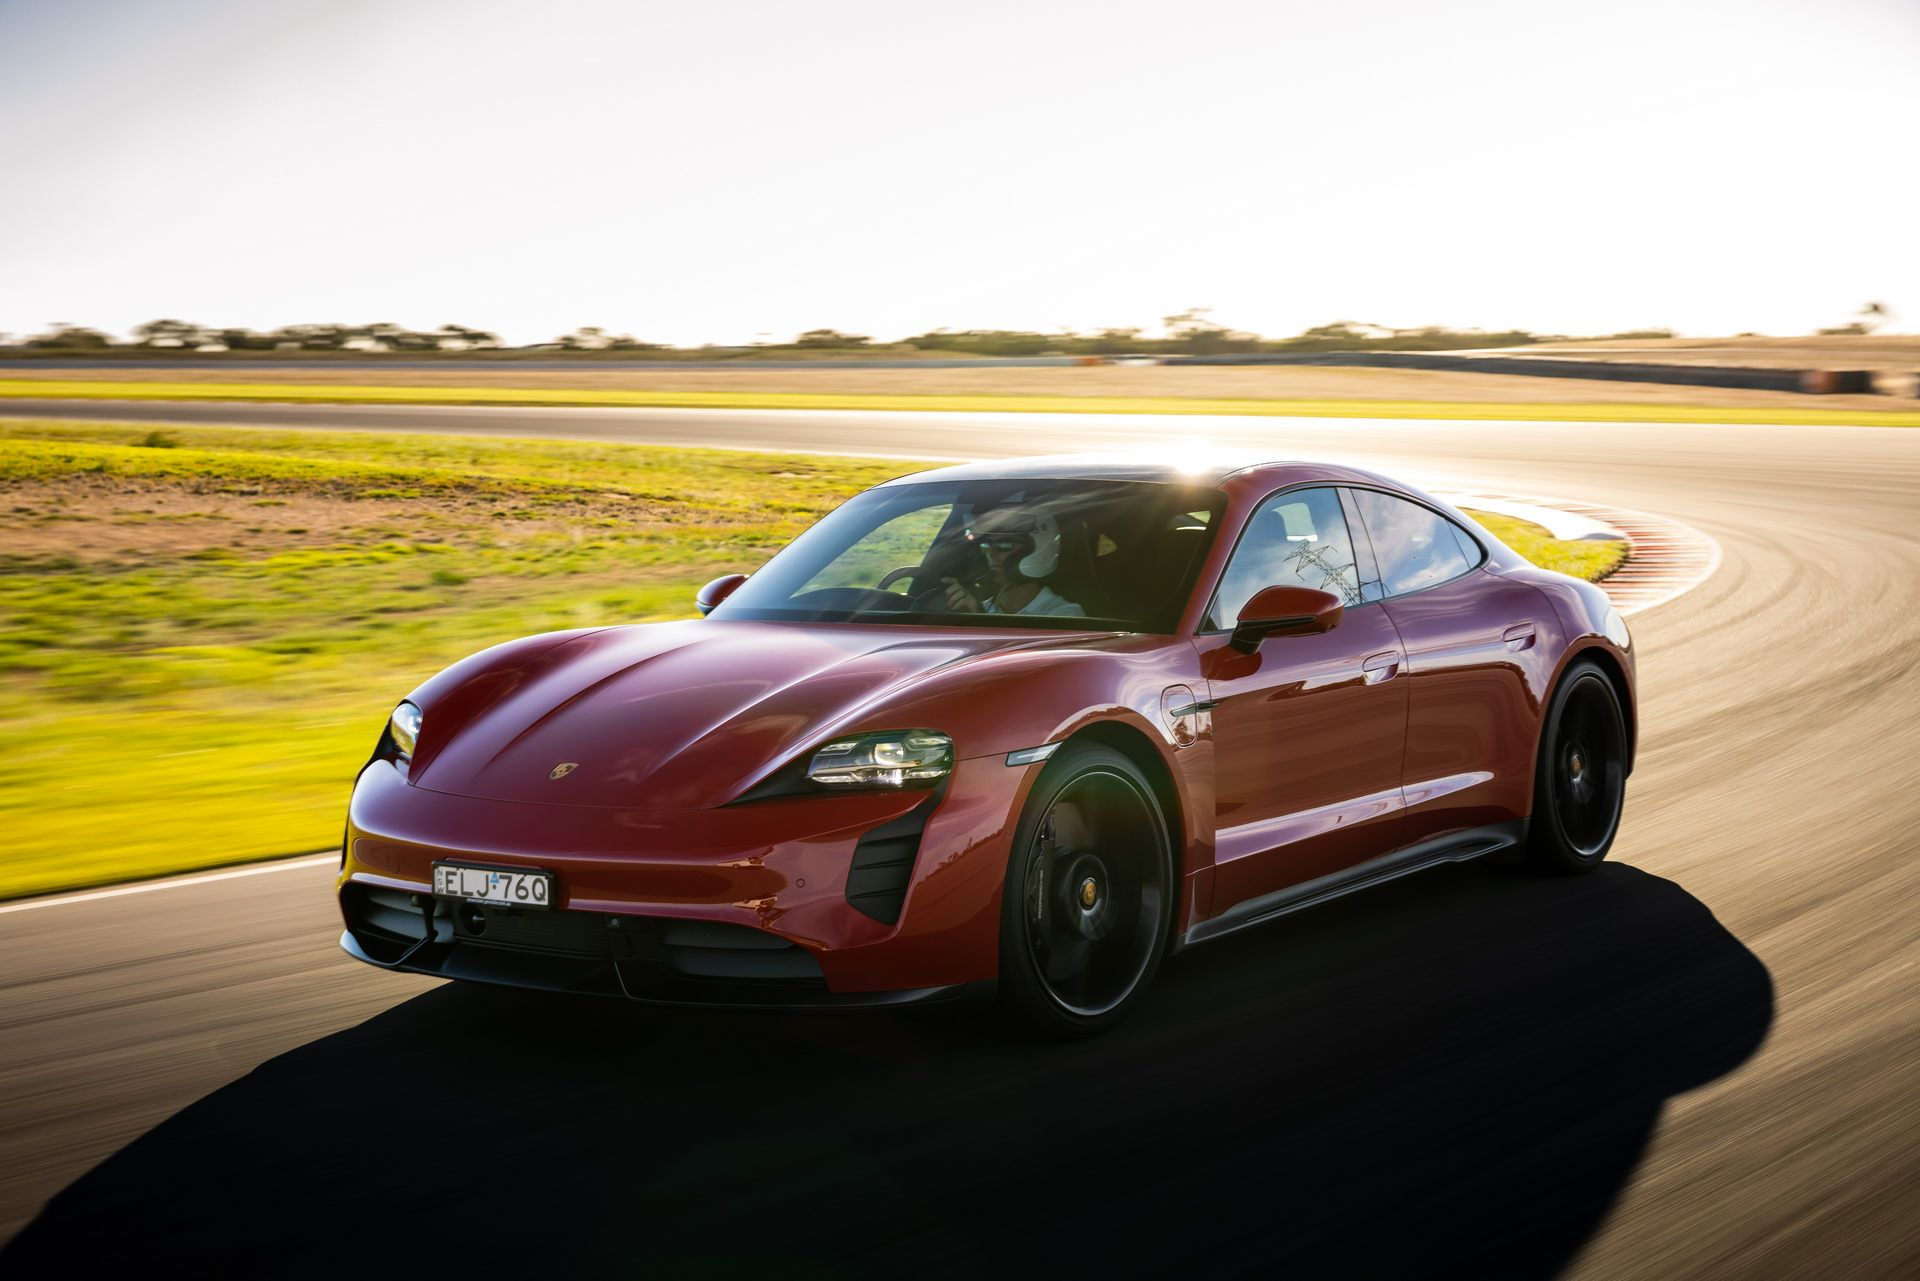 Porsche-Taycan-Turbo-S-The-Bend-Motorsport-Park-26